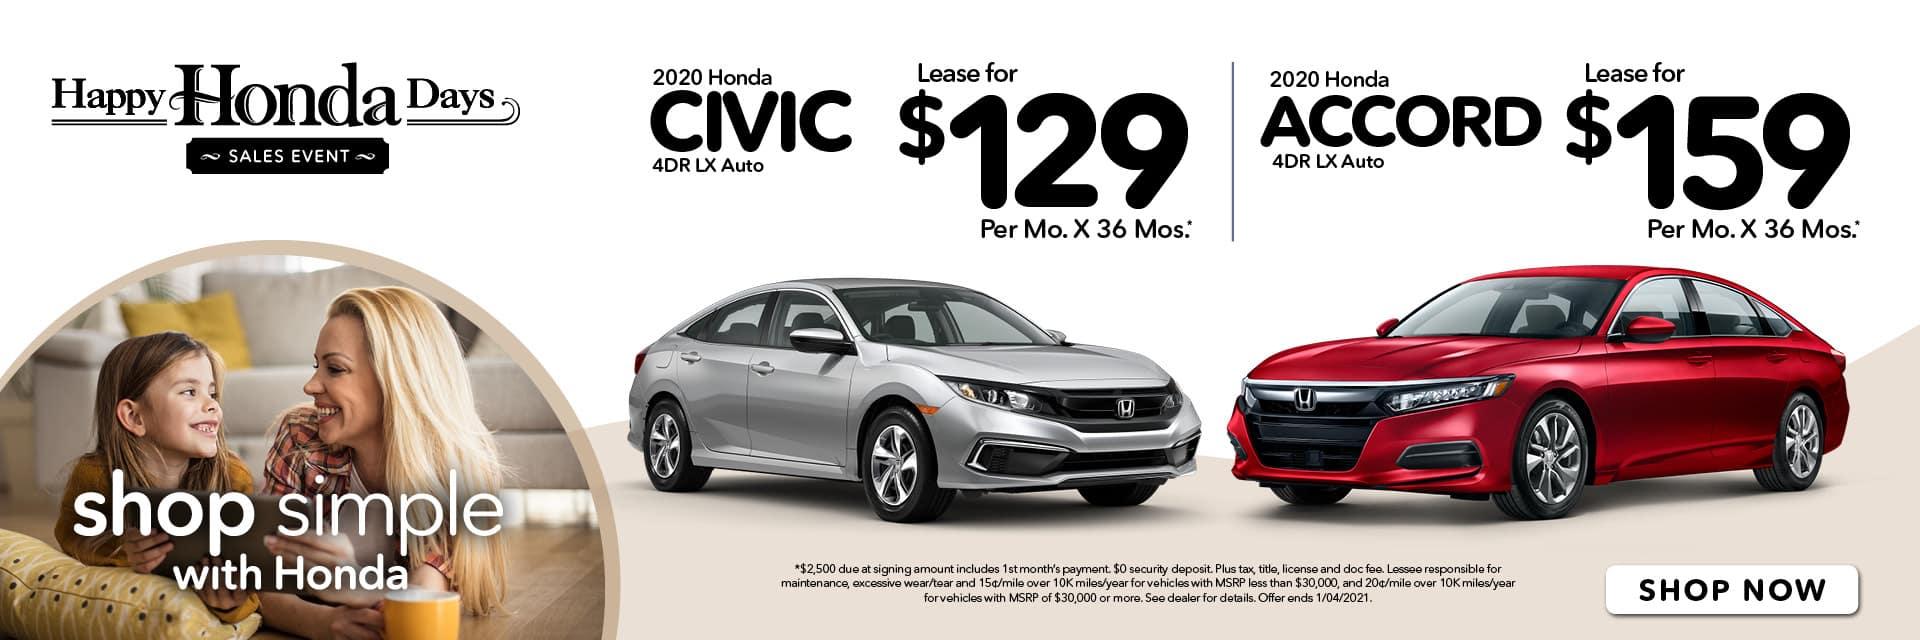 Happy Honda Days Civic & Accord